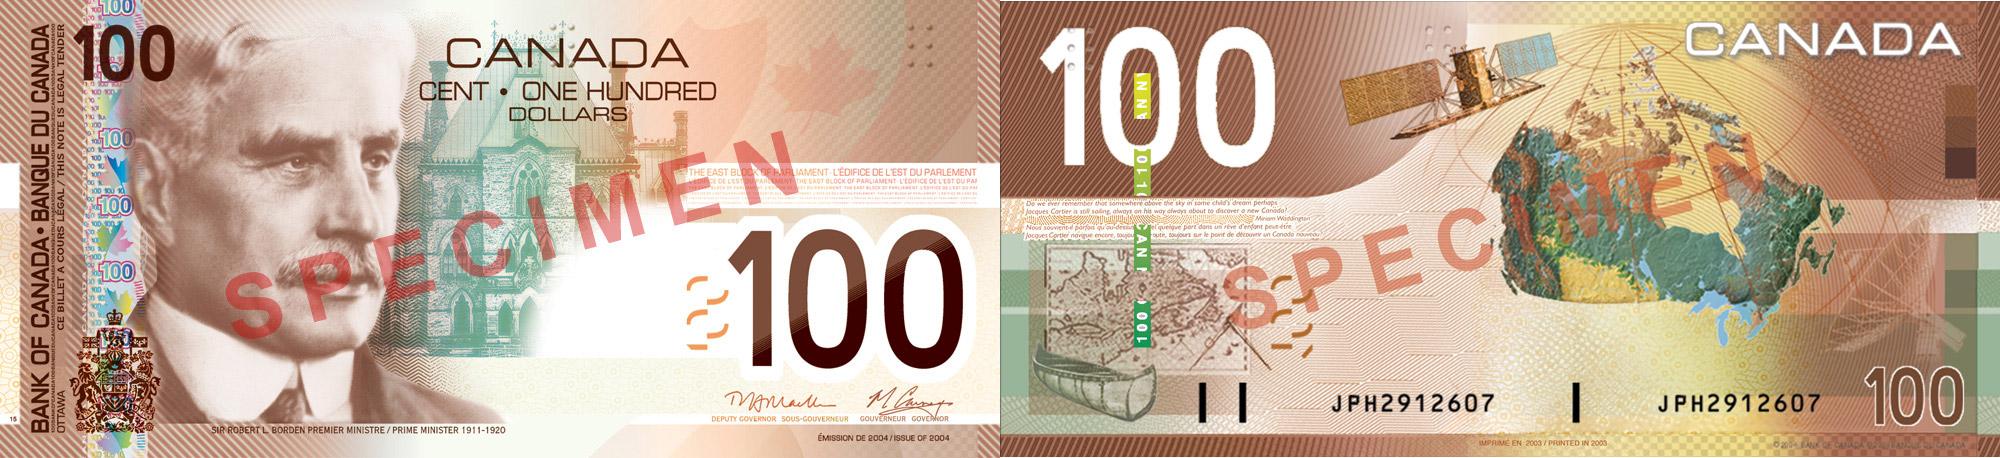 100 dollars 2004-2006 - Canada Banknote